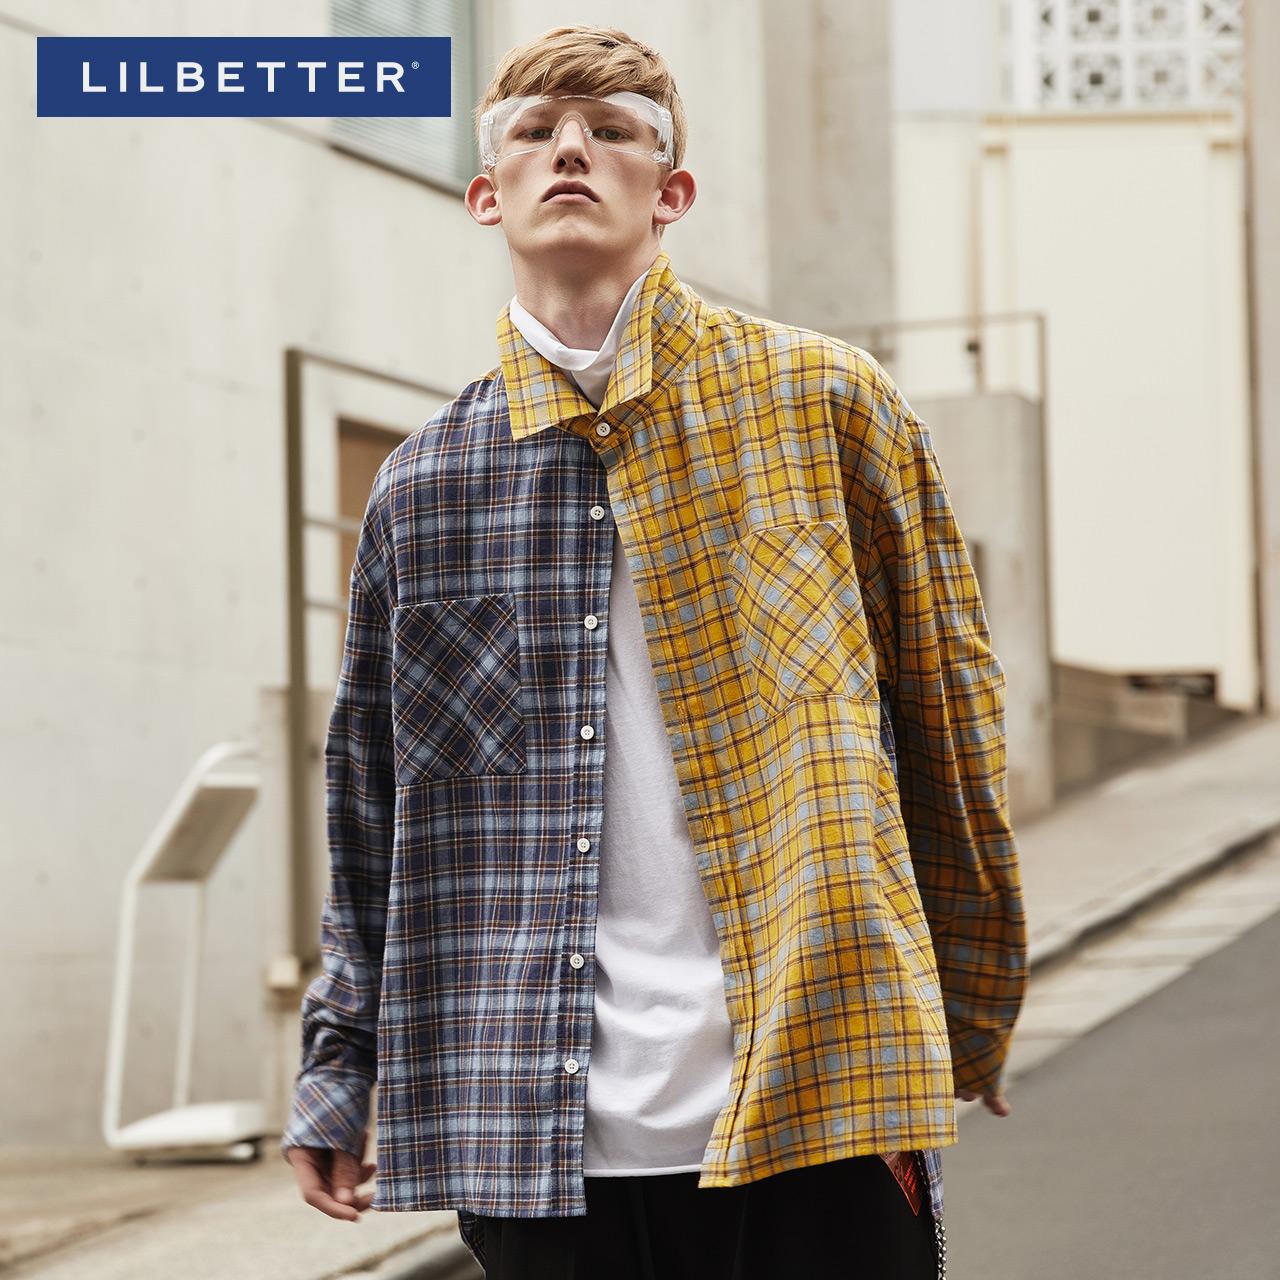 Lilbetter格子衬衫男长袖韩版港风衬衣撞色休闲花衬衫国潮男衬衣